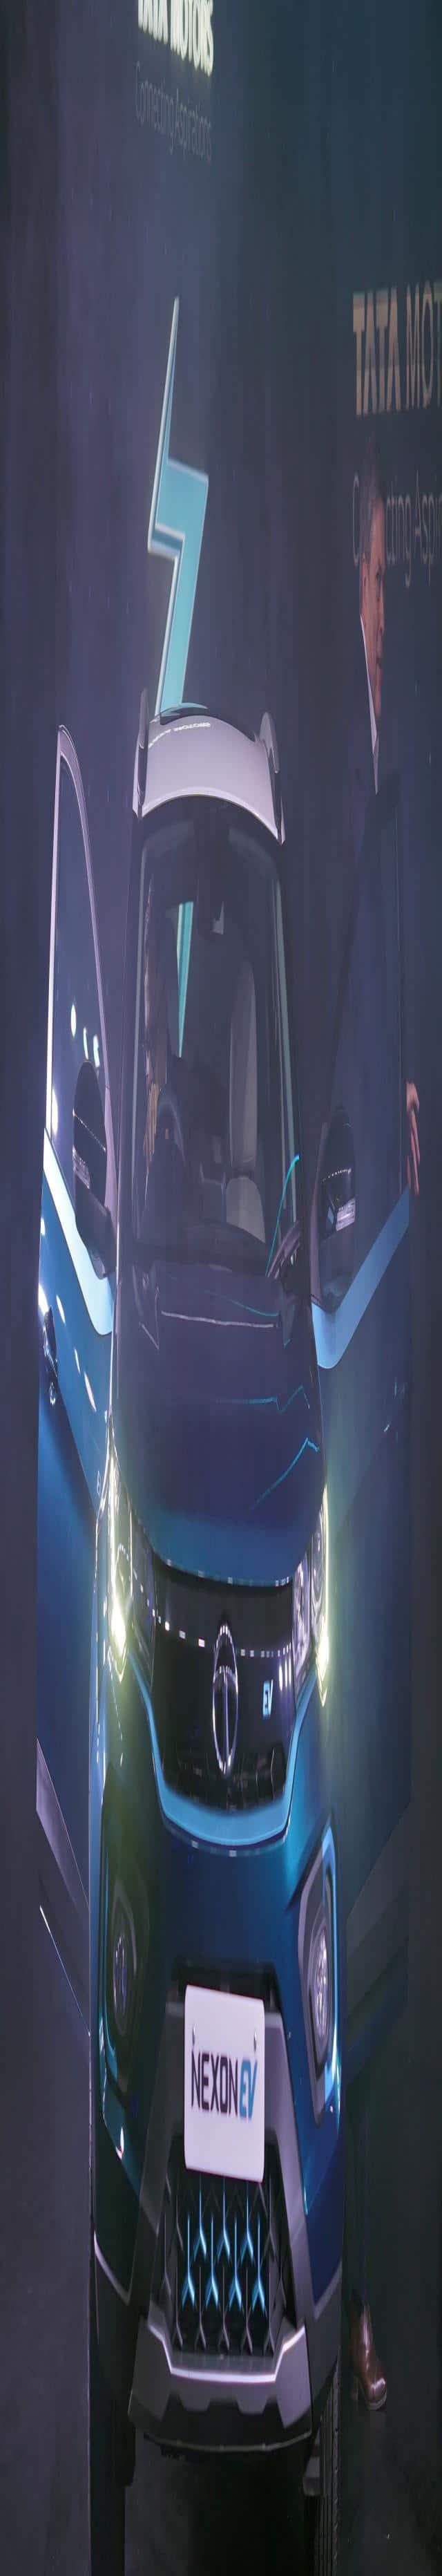 टाटा मोटर्स ने पेश किया नेक्सन का इलेक्ट्रिक संस्करण Nexon EV